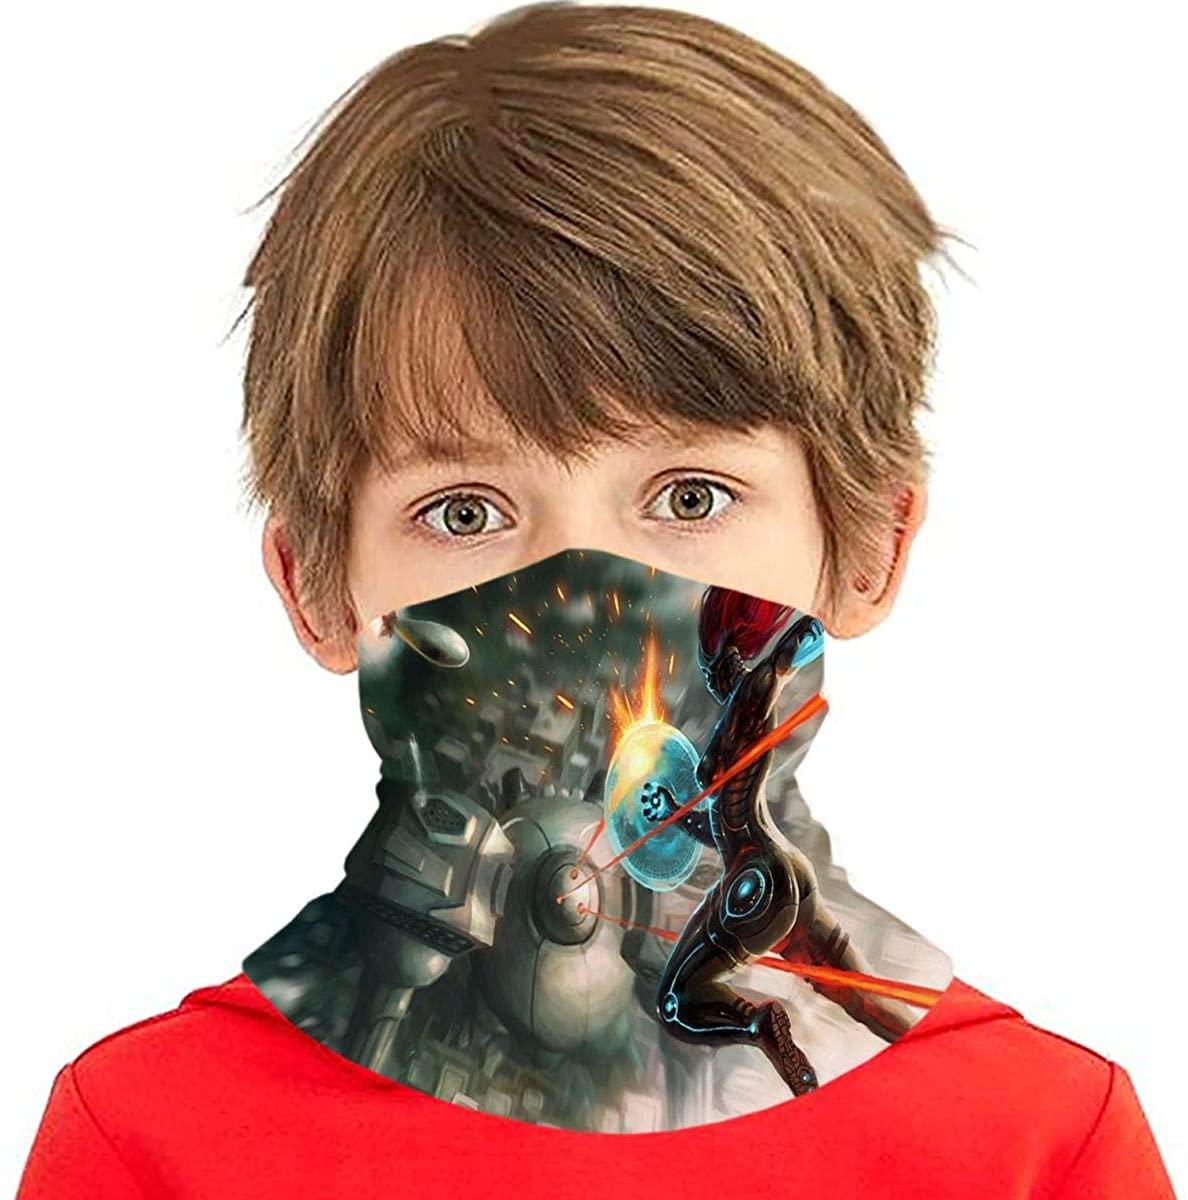 Anime Sci-Fi Robot Battle Battleship War Children's Face Scarf Windproof Protection Balaclava, Multifunctional Headwear Neck Gaiter for Kids Teens, Dust Sun Uv Black